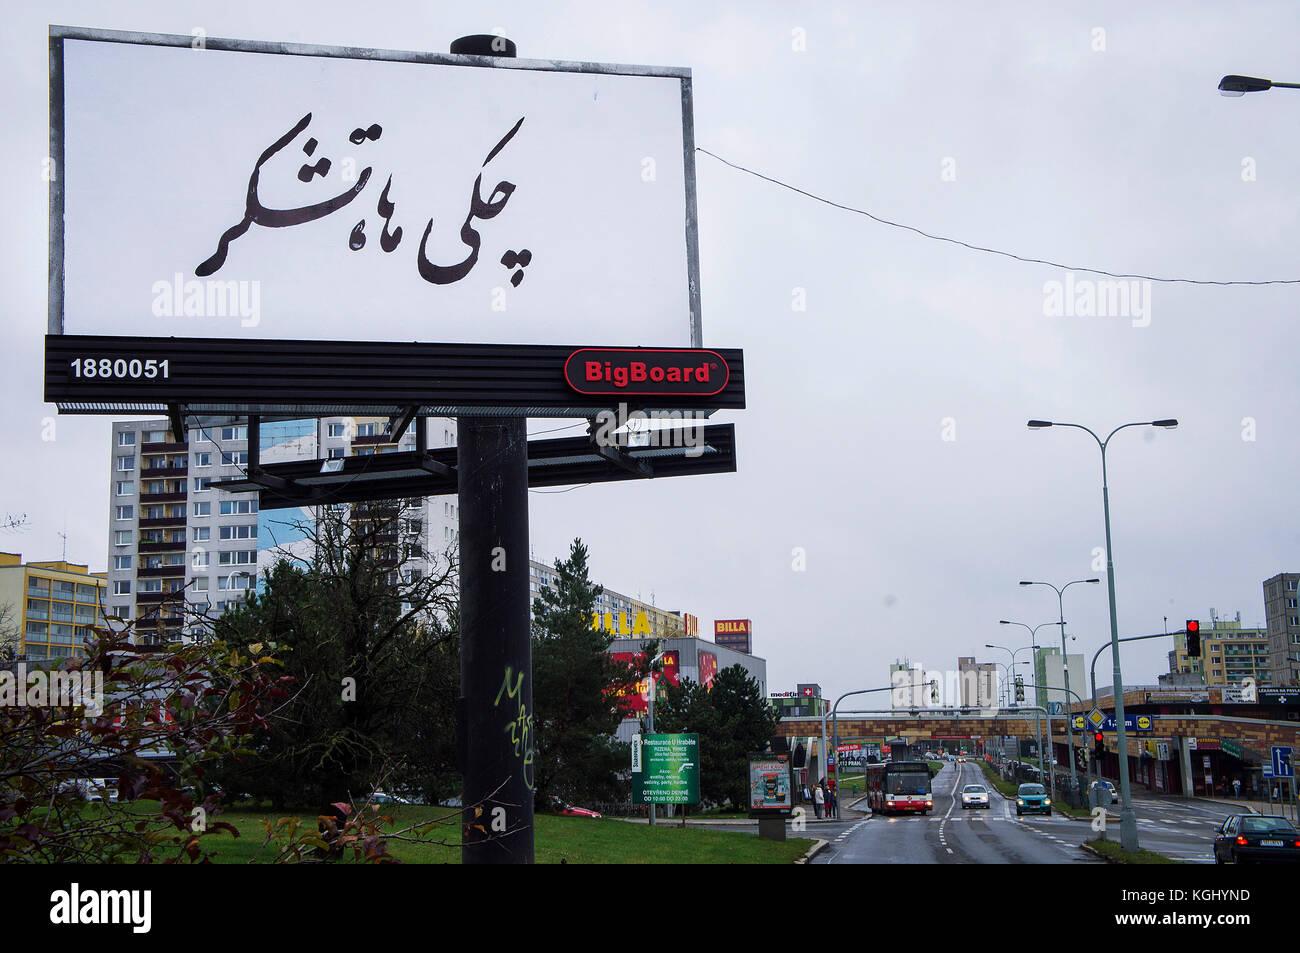 Bigboard or billboard: which option is correct